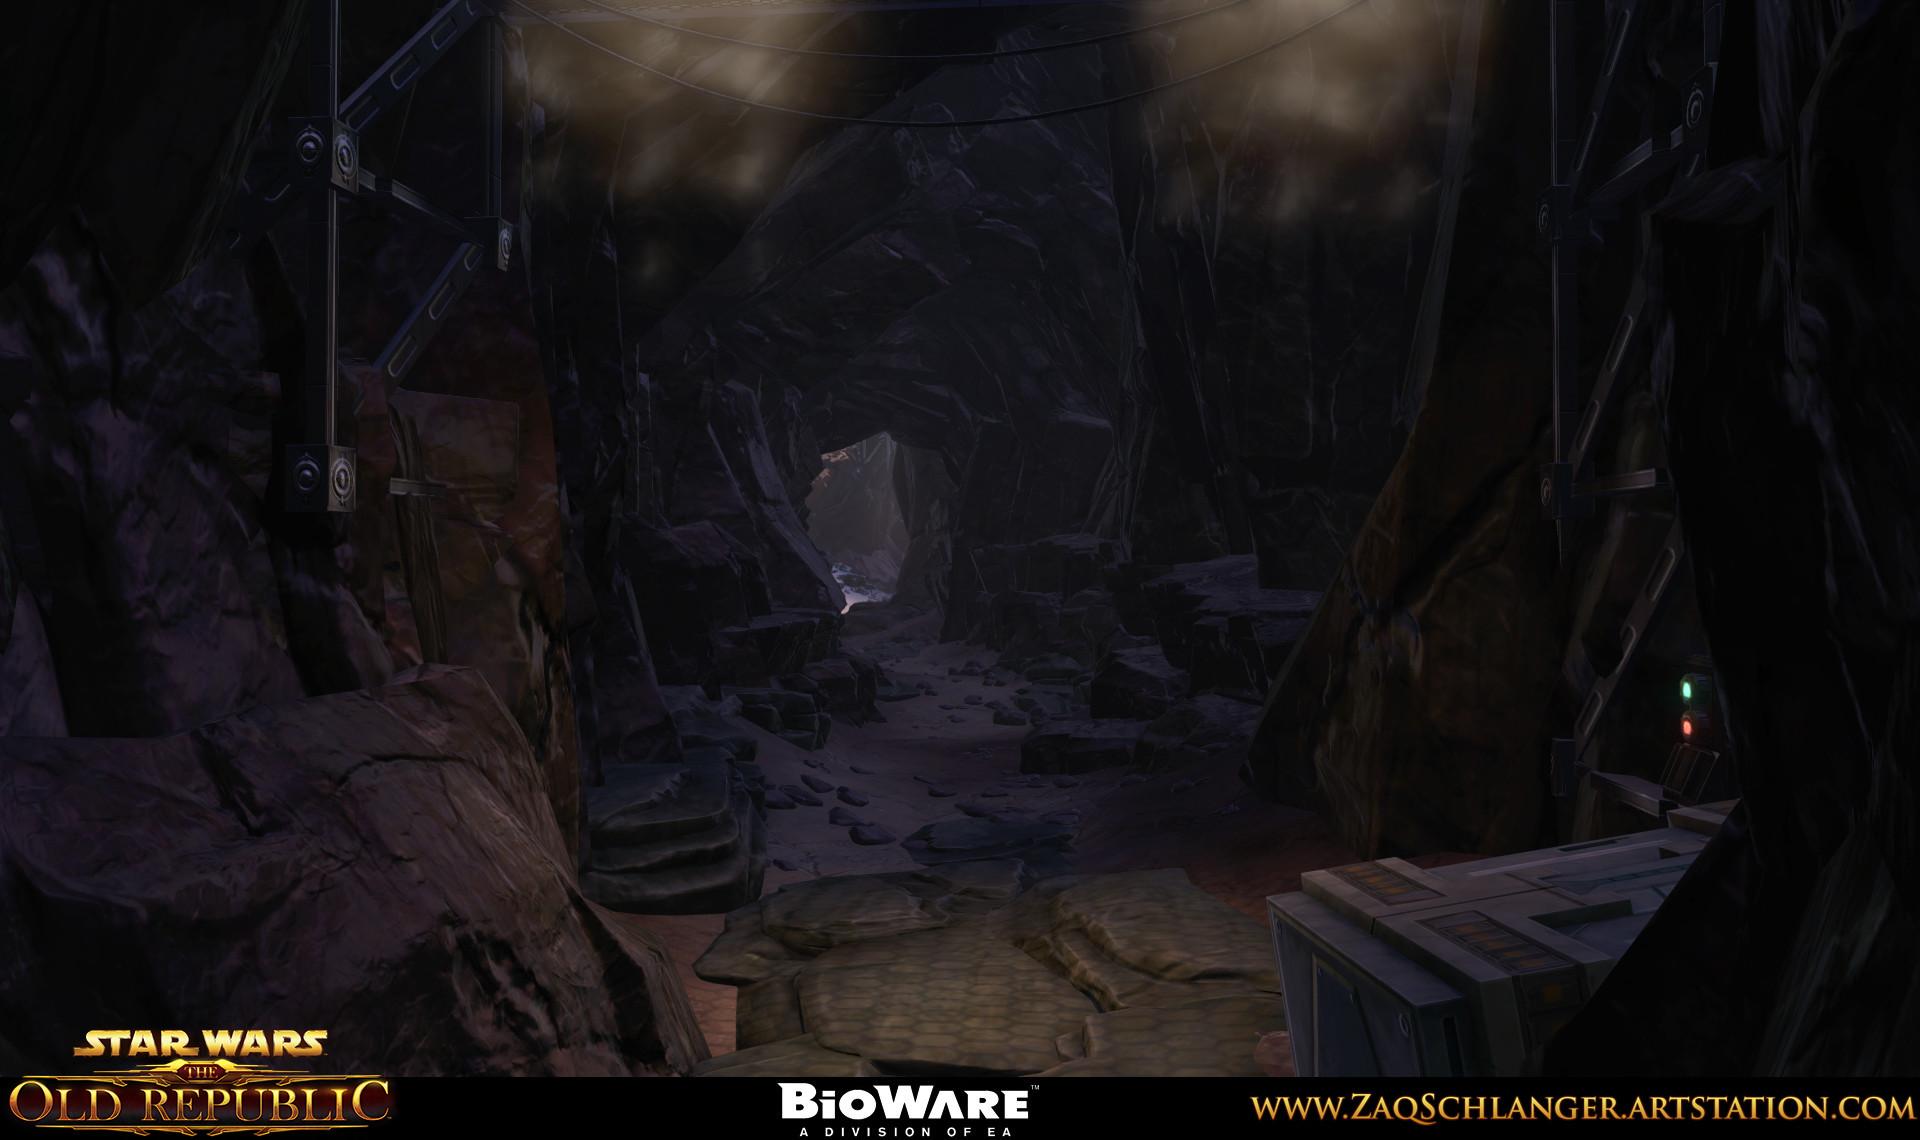 Zachary schlanger zaqschlanger copero caves natural 02